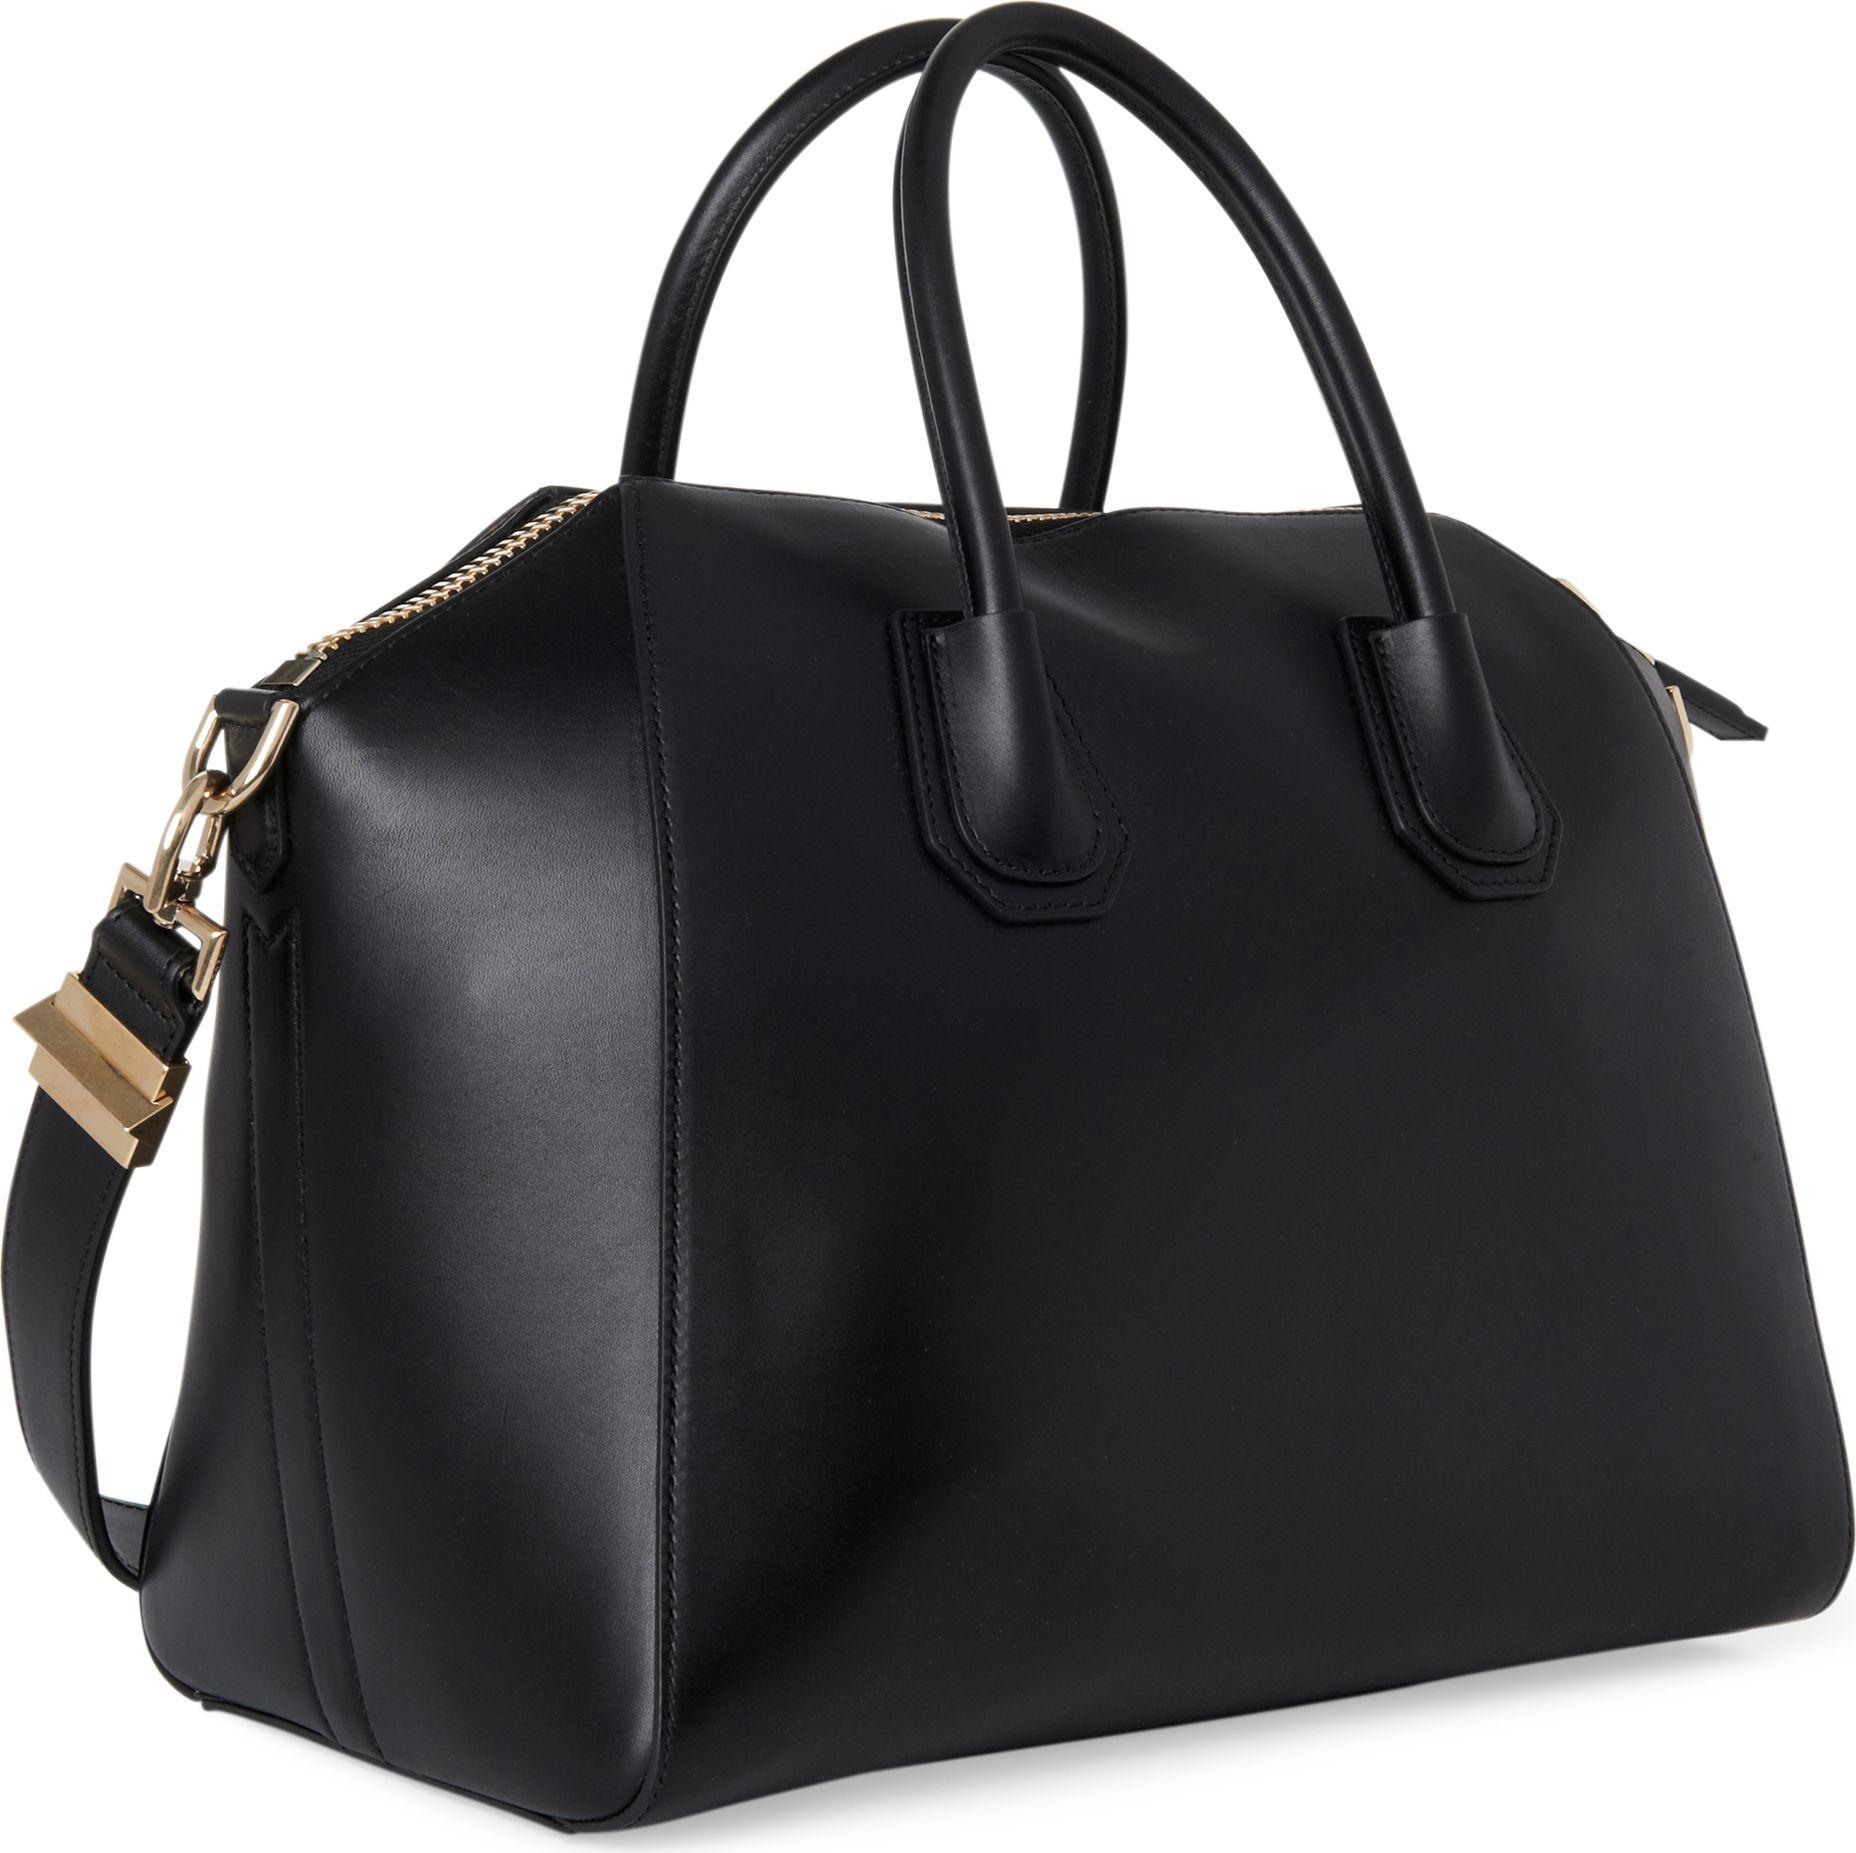 cbf495ae03bc Lyst - Givenchy Antigona Medium Smooth Leather Tote in Black